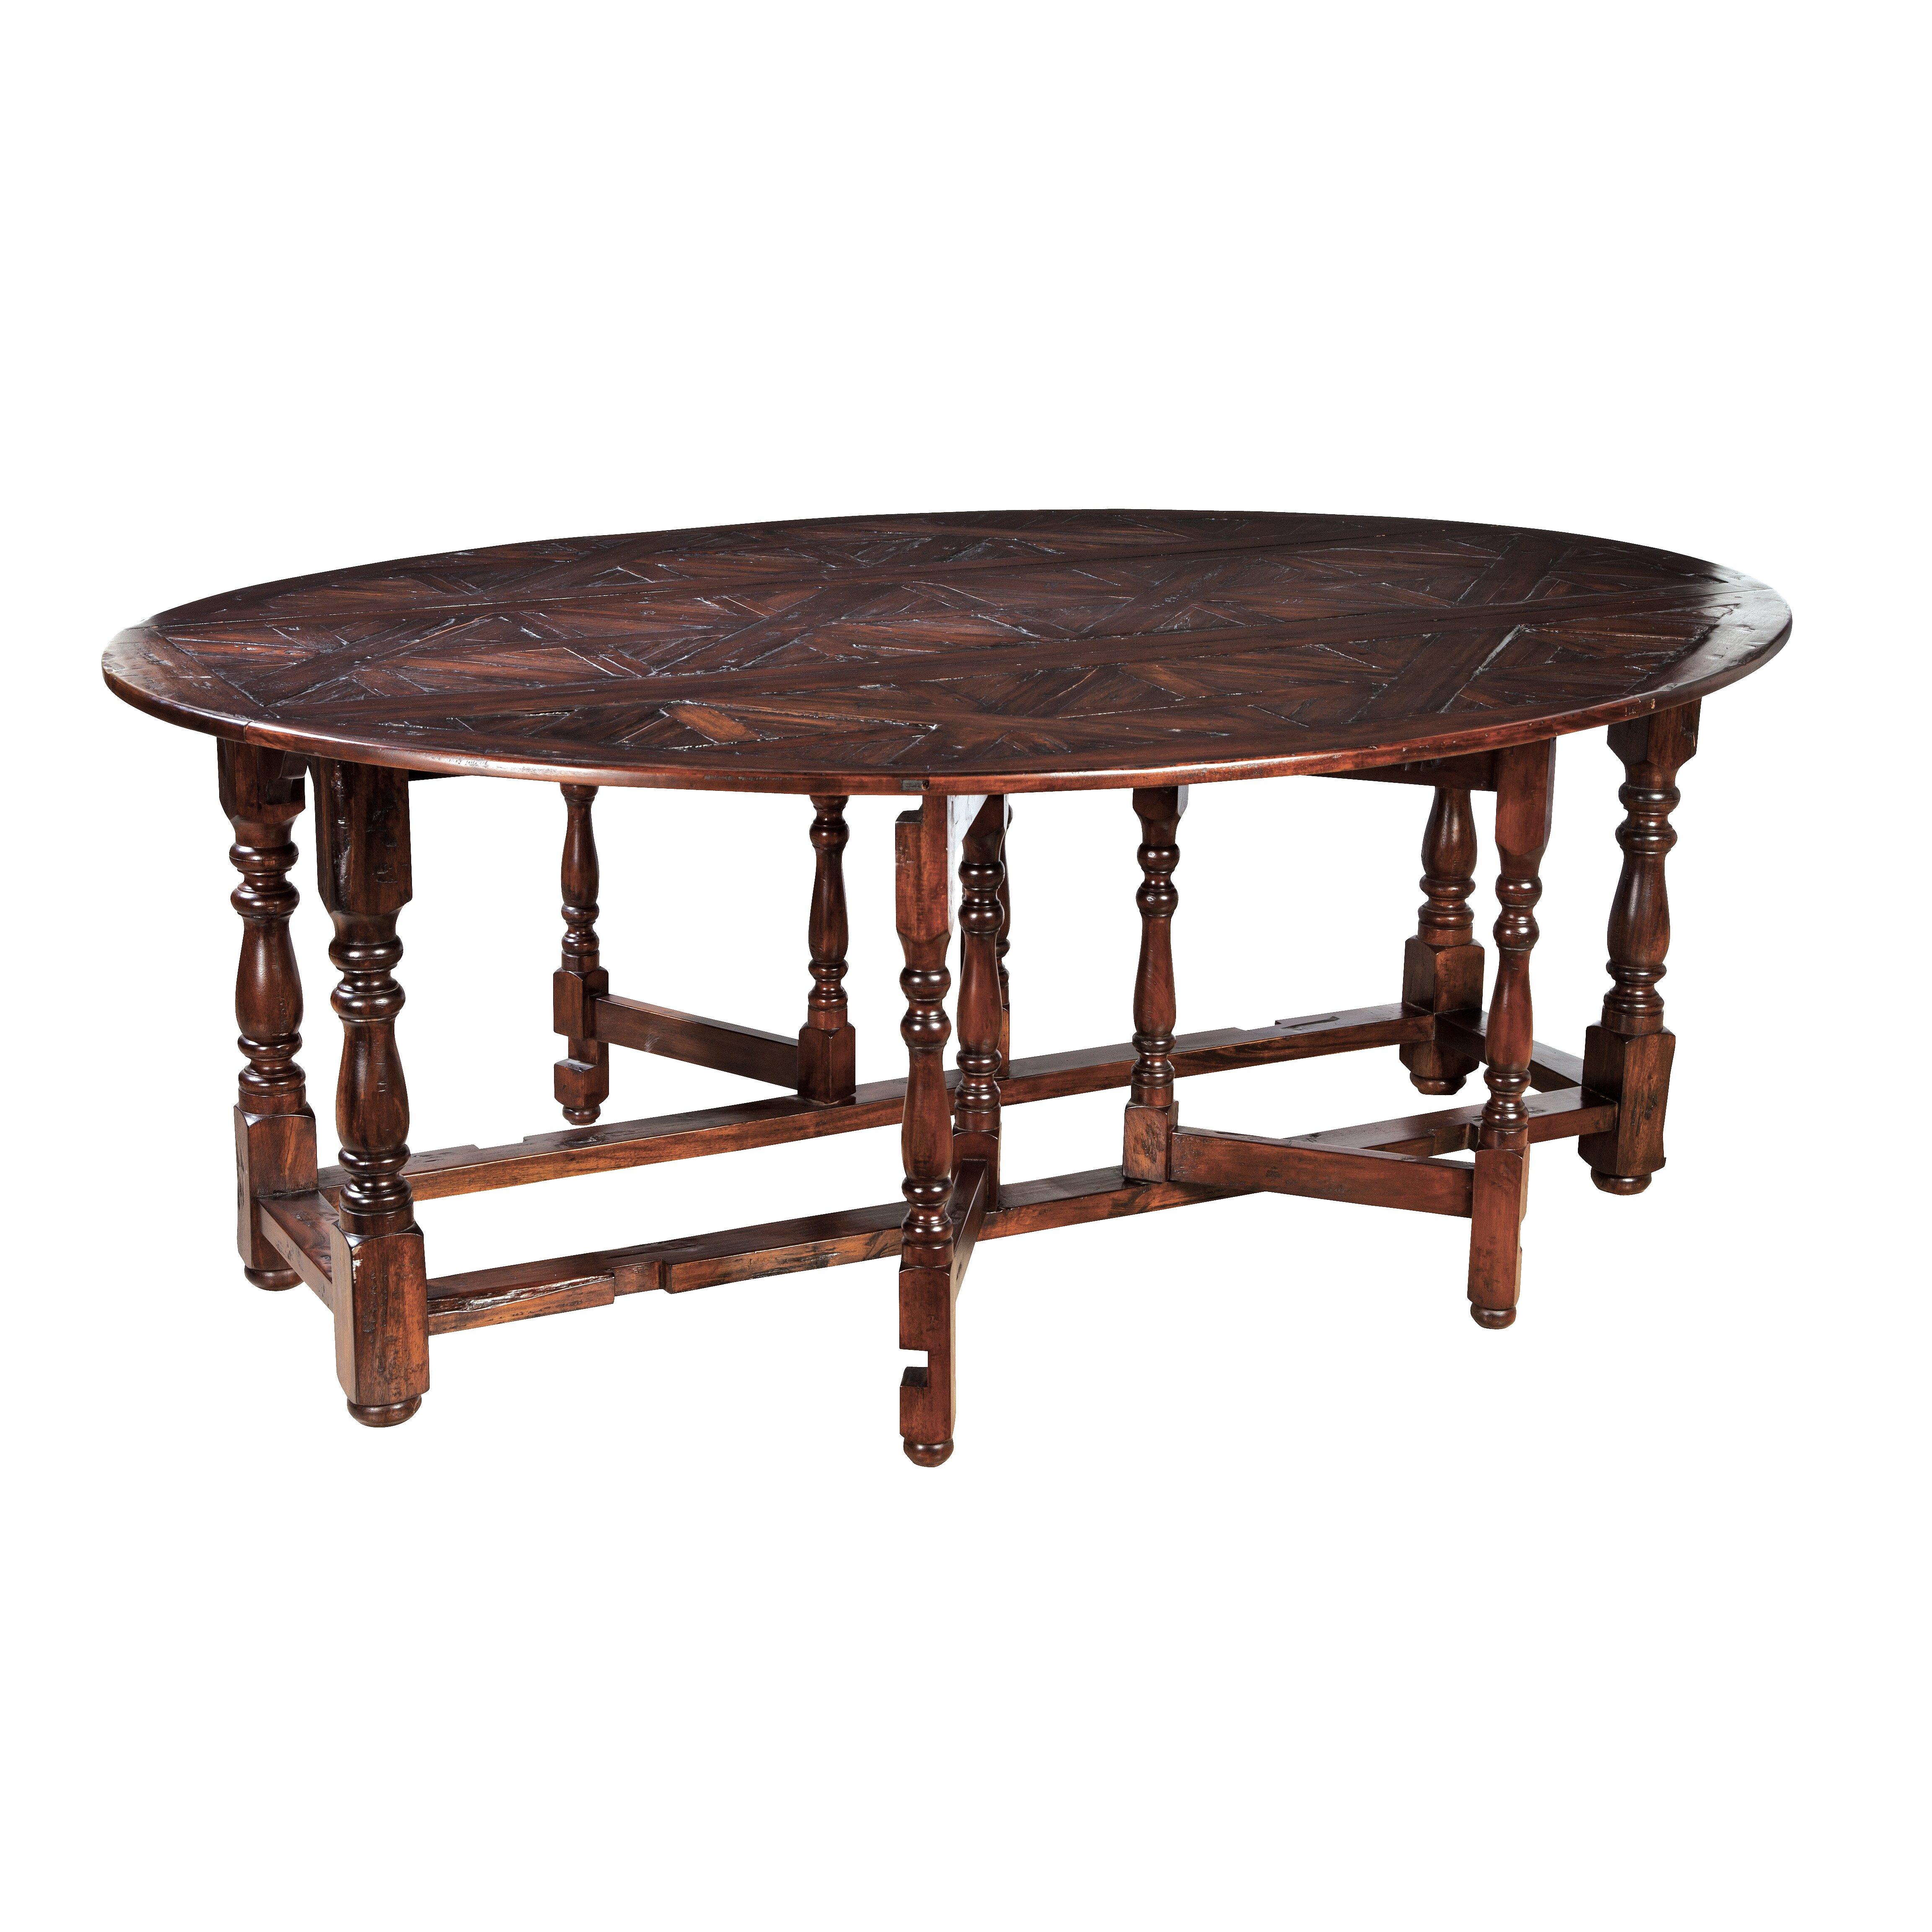 Furniture classics ltd gateleg dining table wayfair for Gateleg dining table